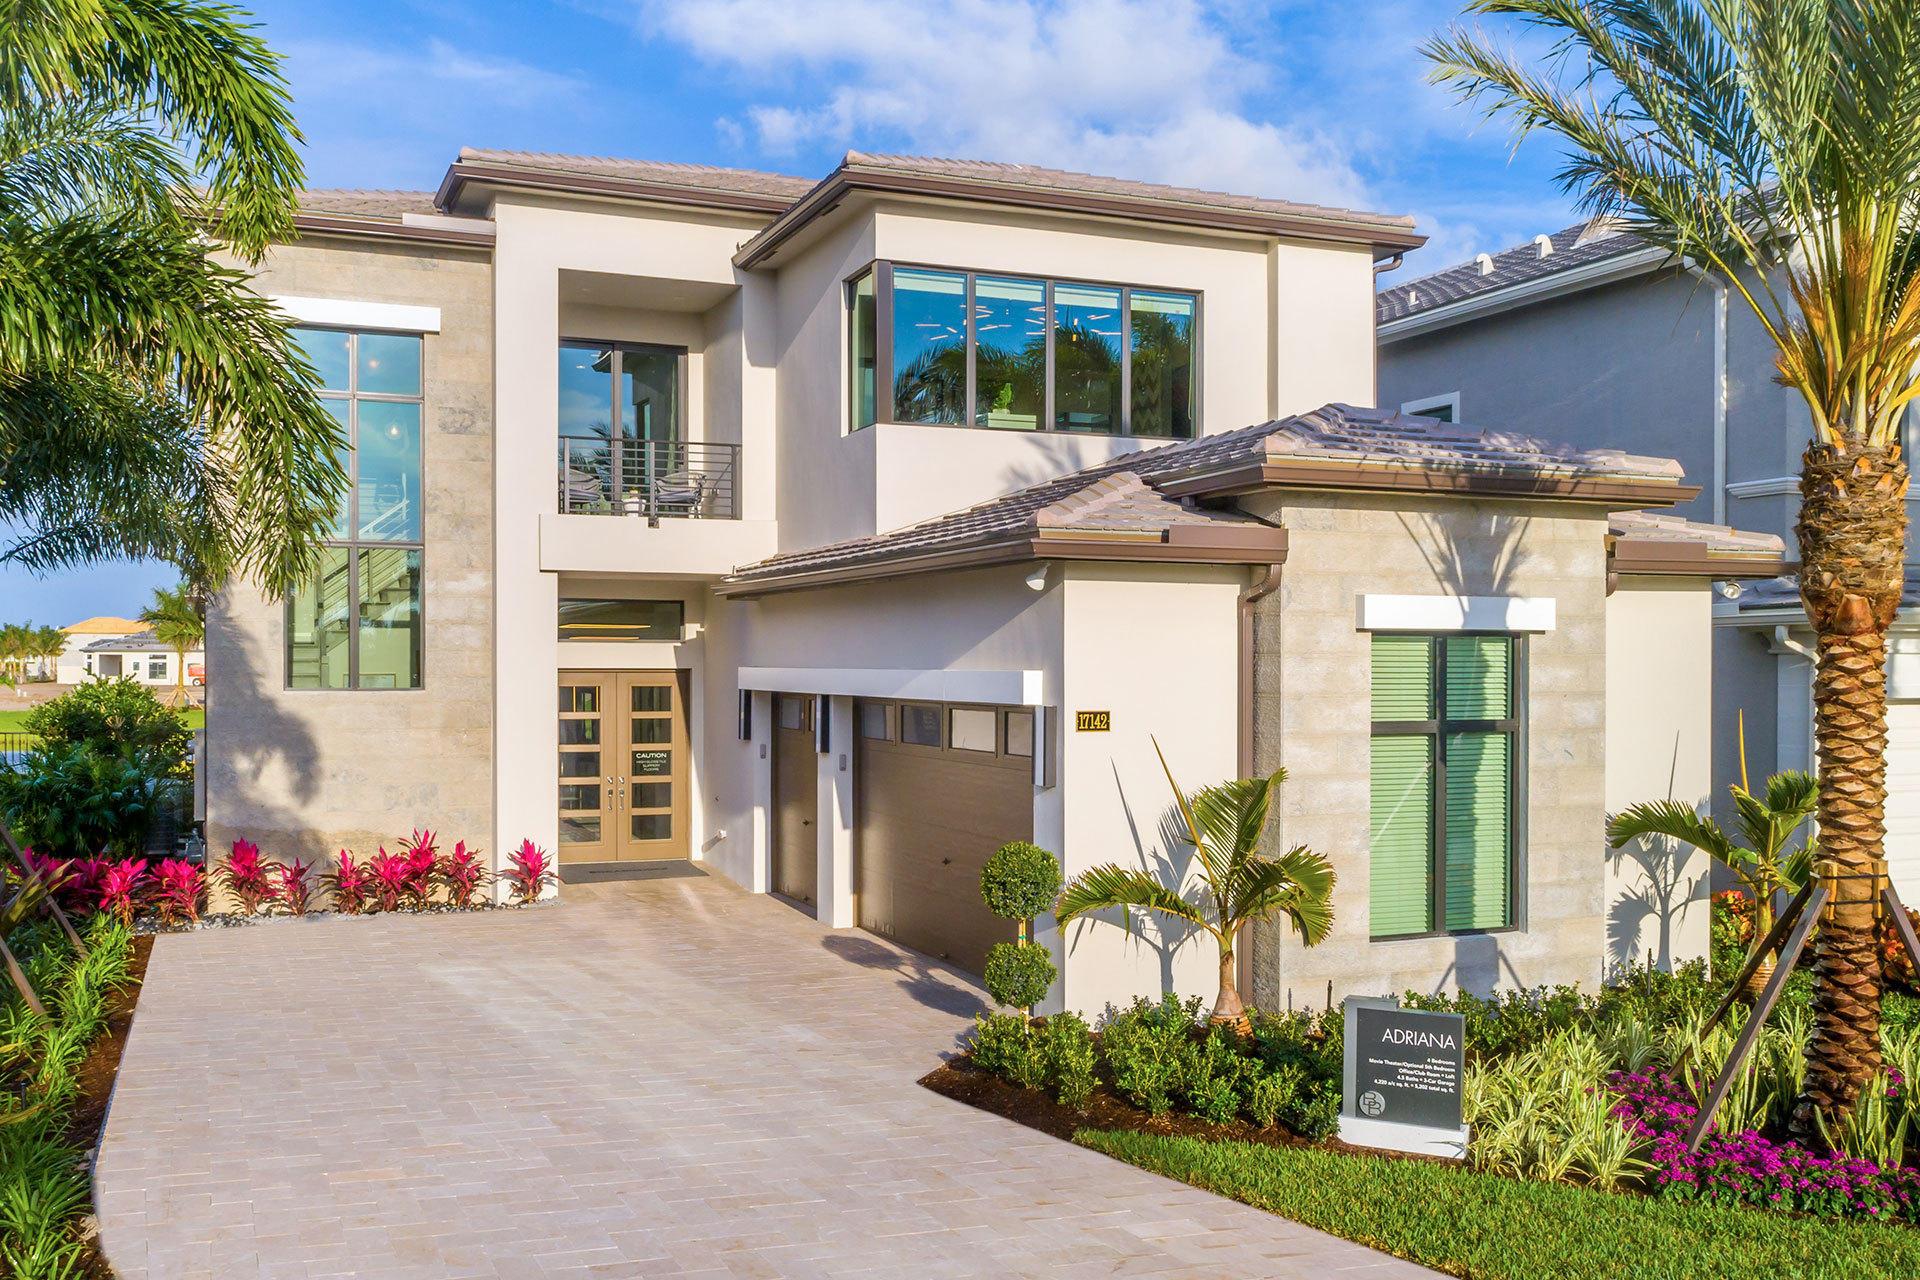 17317 Santaluce Manor Boca Raton, FL 33496